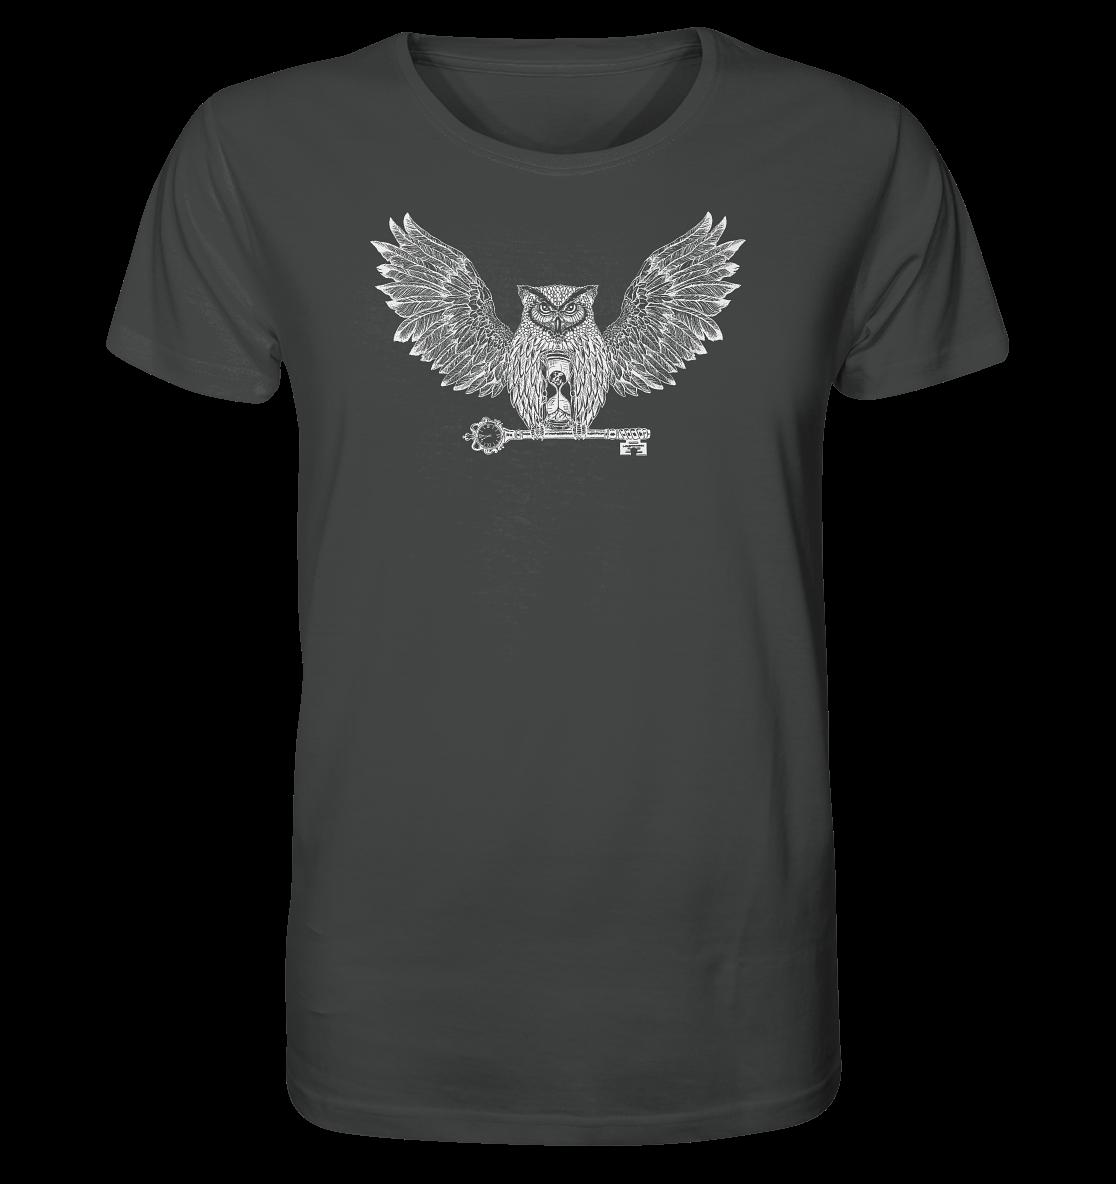 front-organic-shirt-444545-1116x-4.png